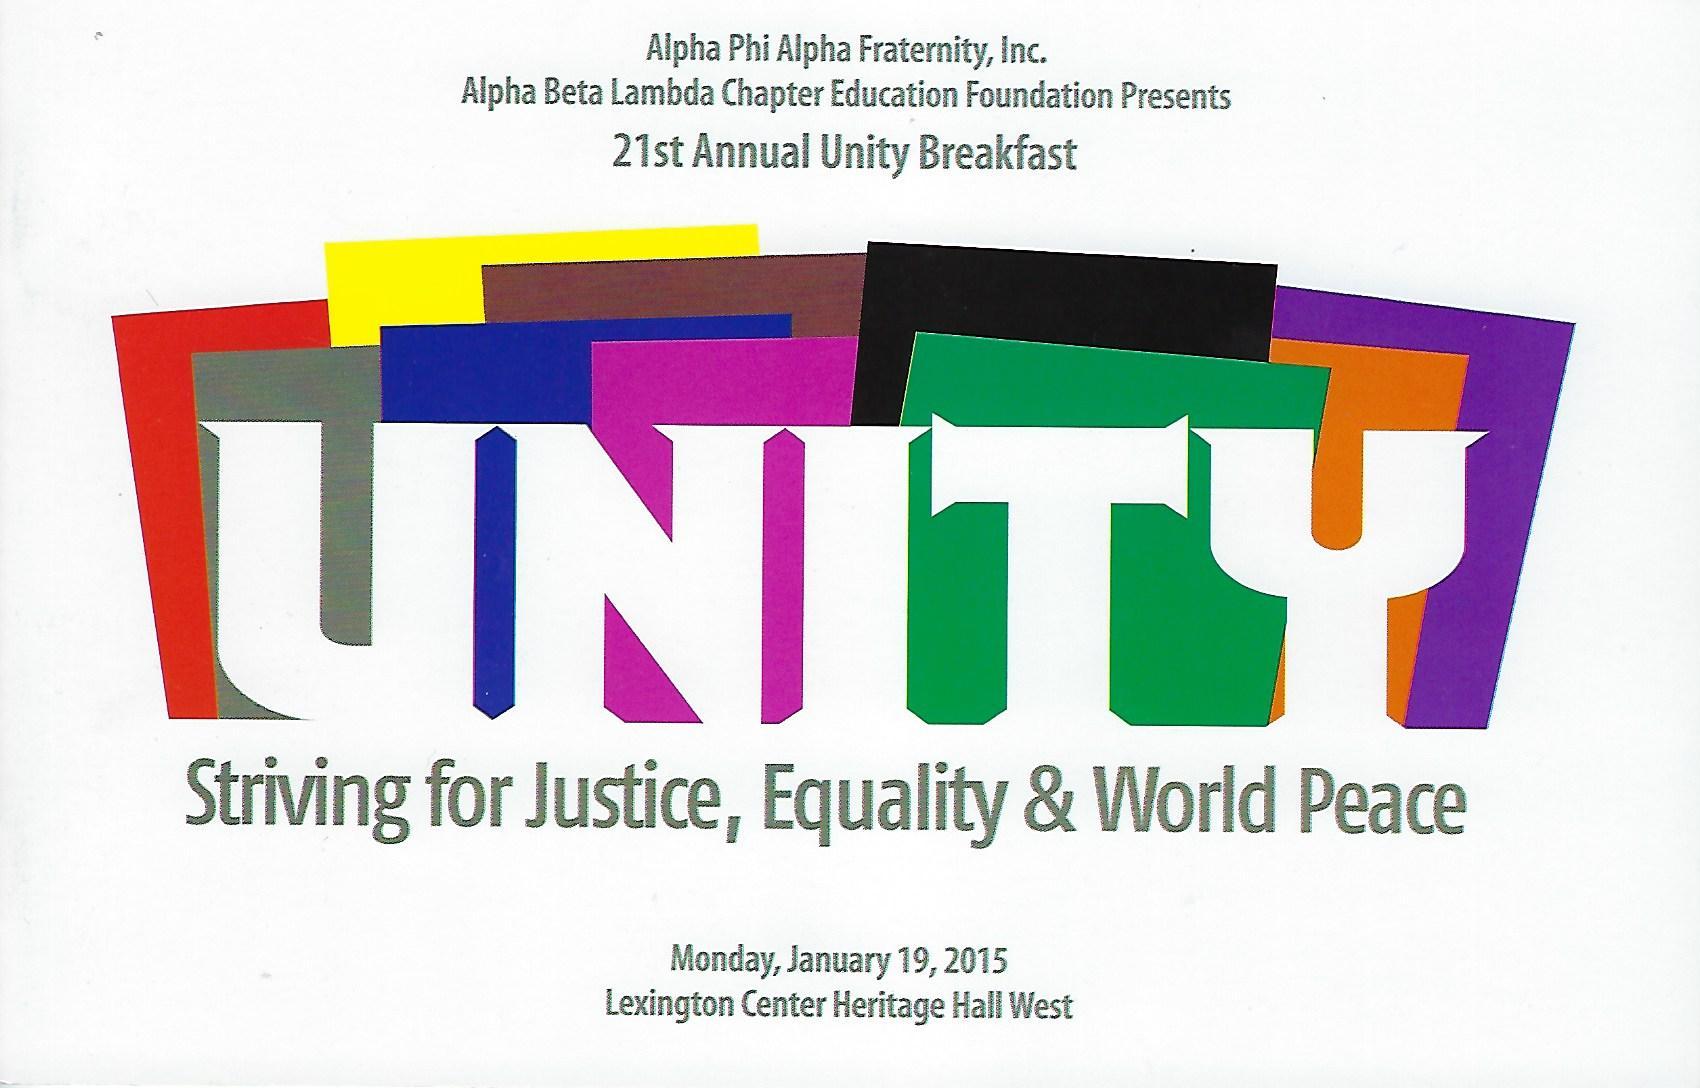 unity breakfast alpha beta